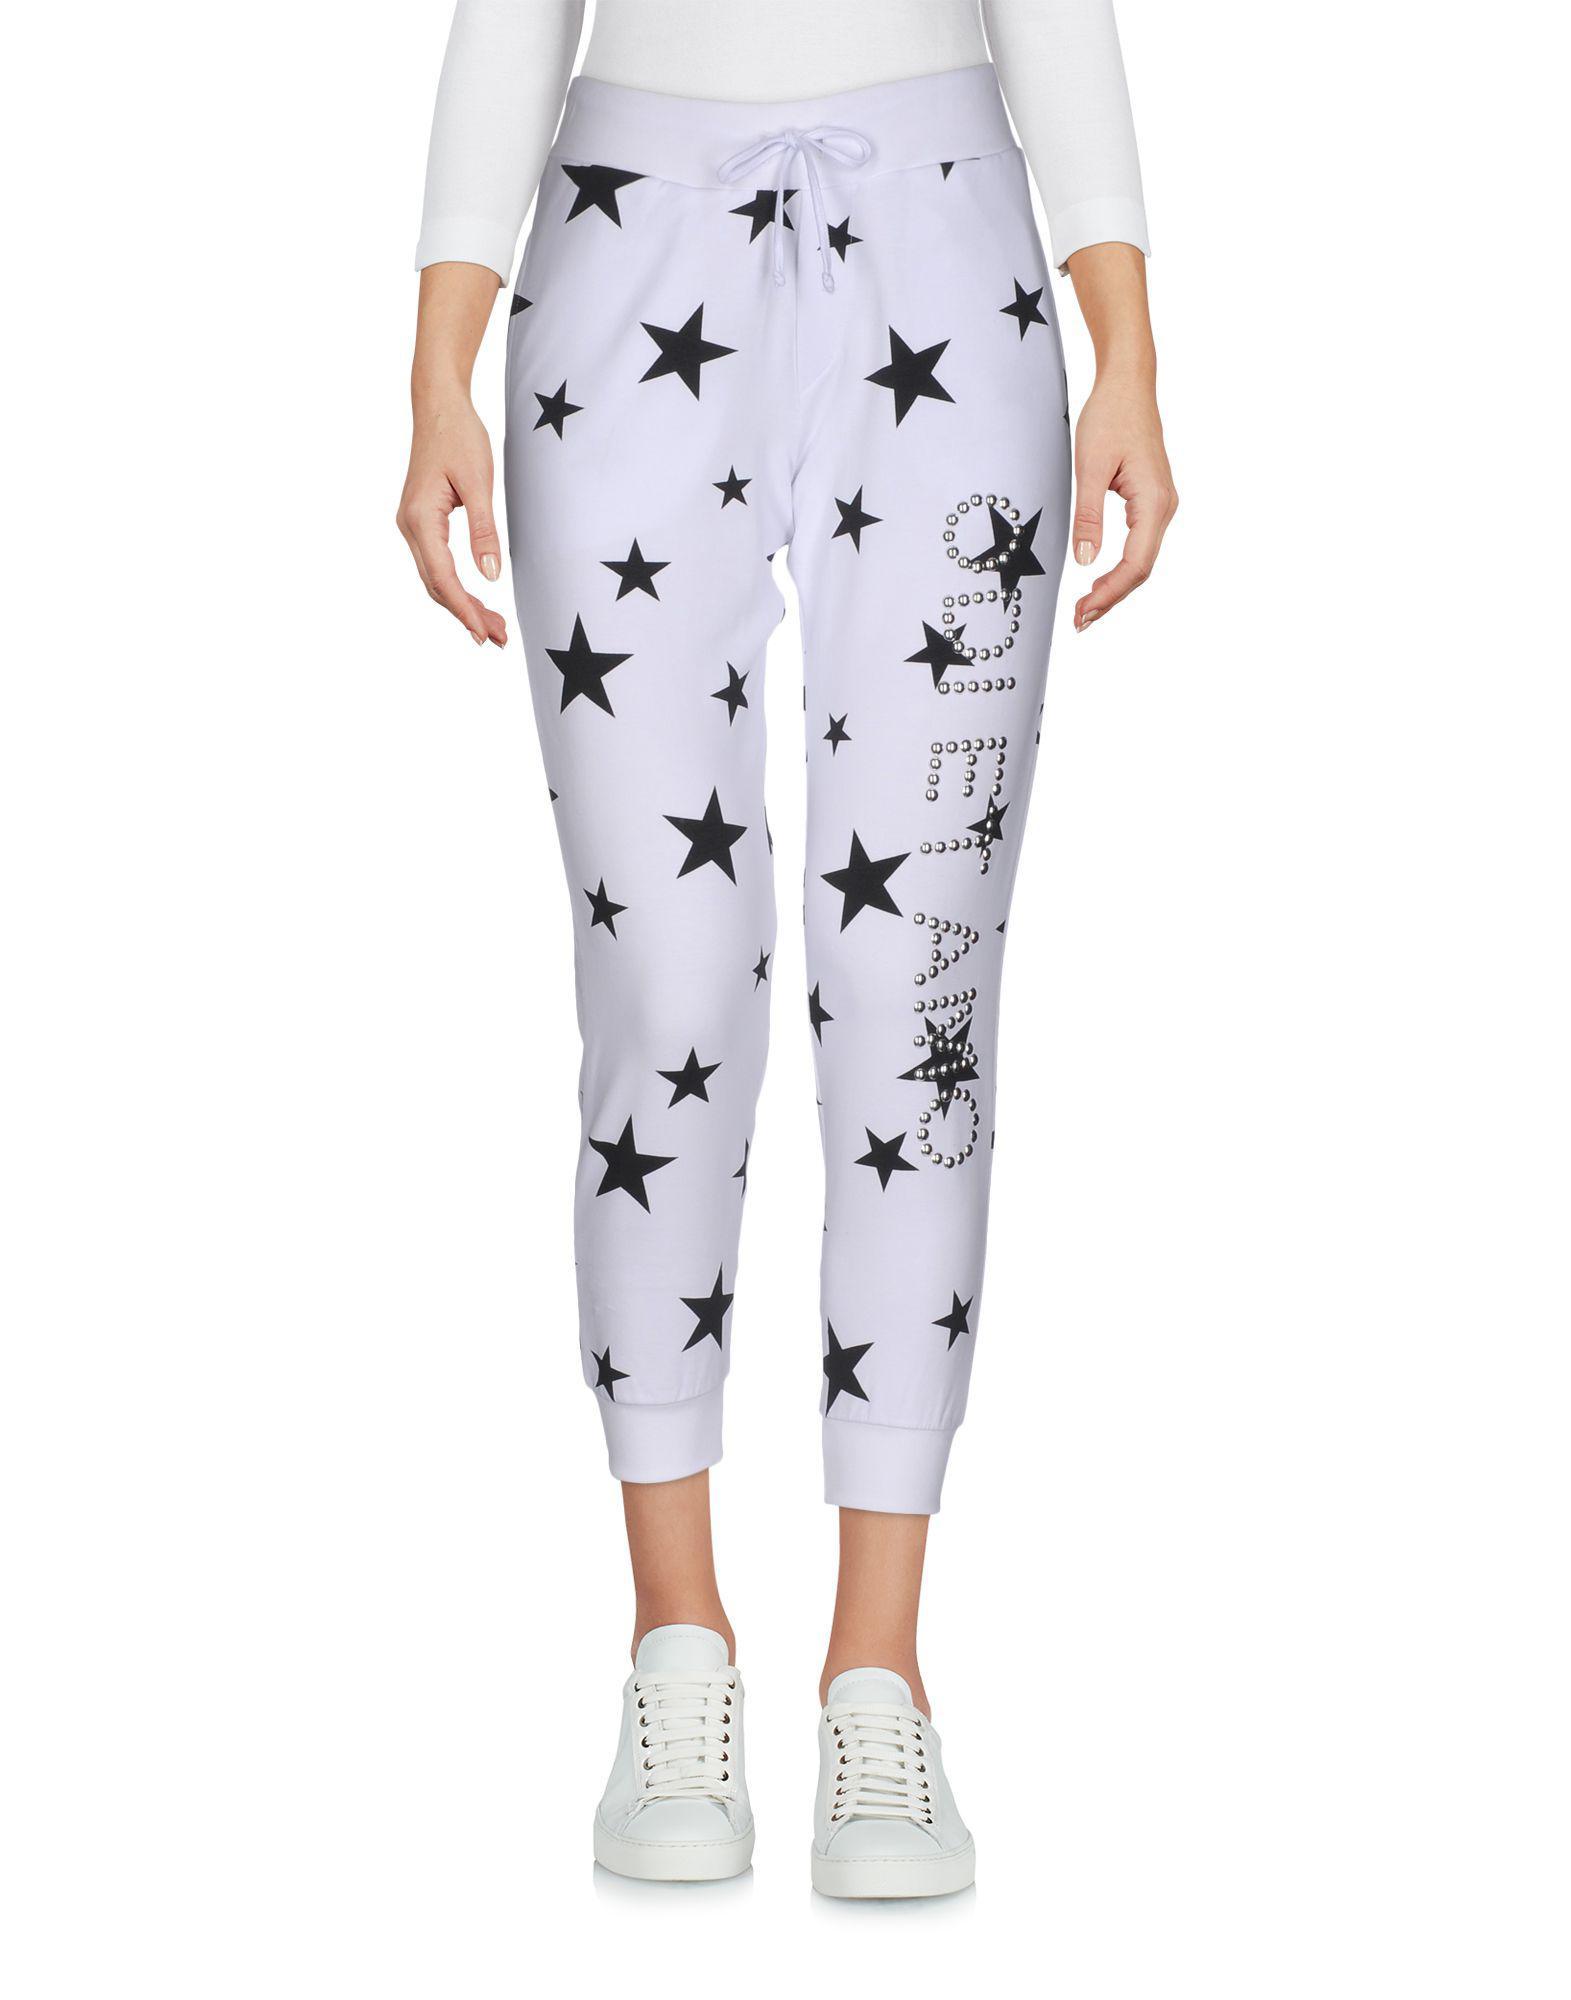 TROUSERS - 3/4-length trousers Odi Et Amo qAw4uzK